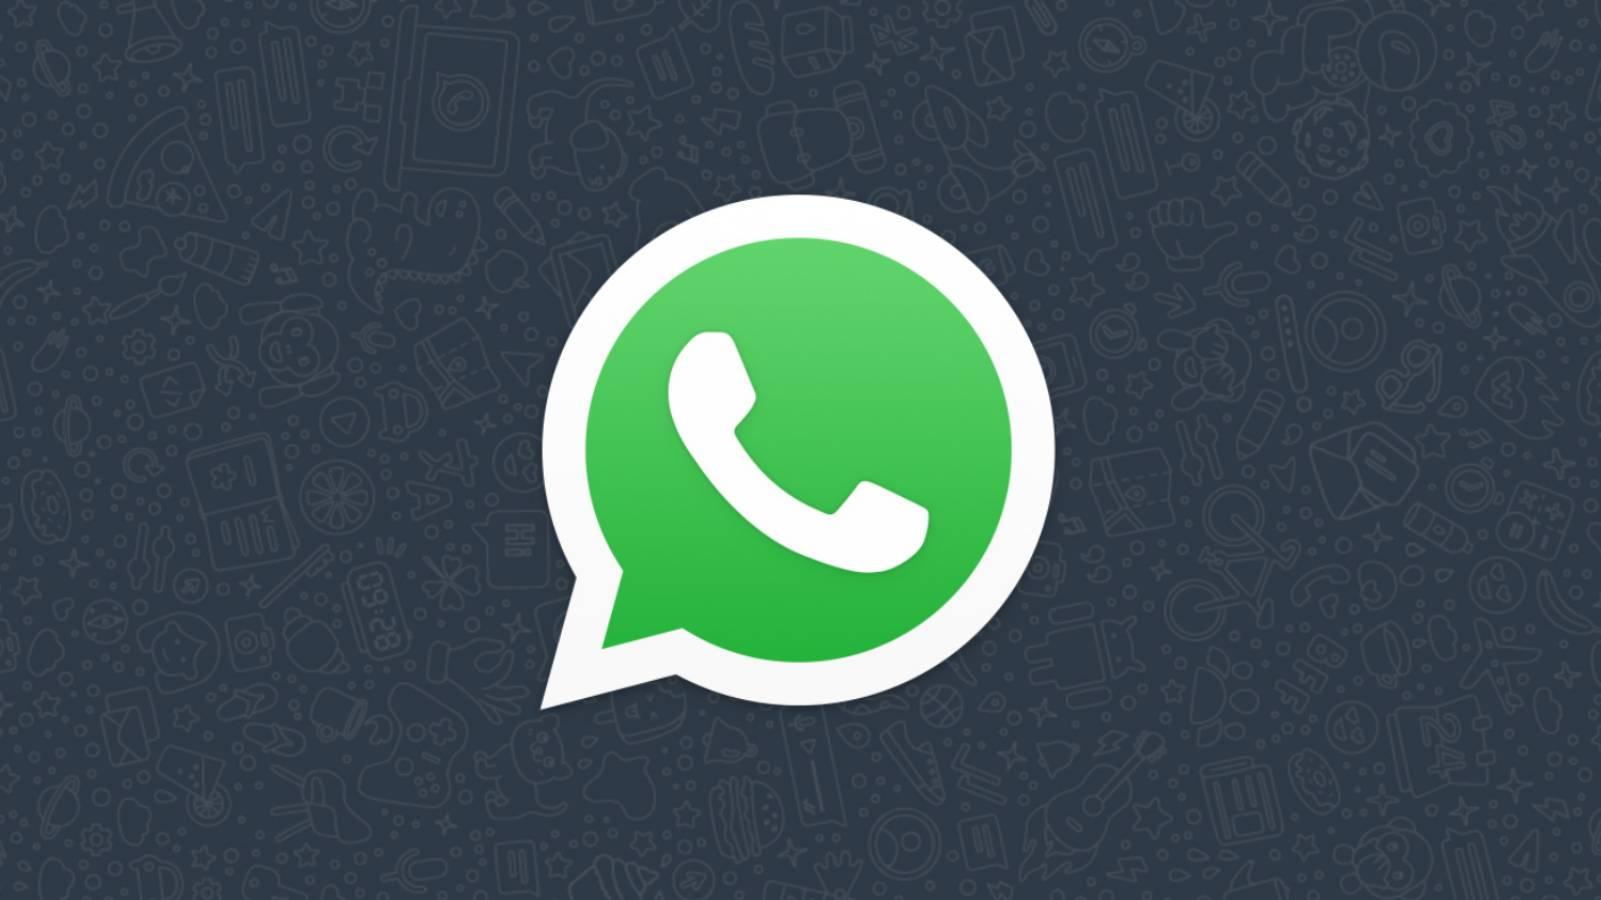 WhatsApp inspaimantator